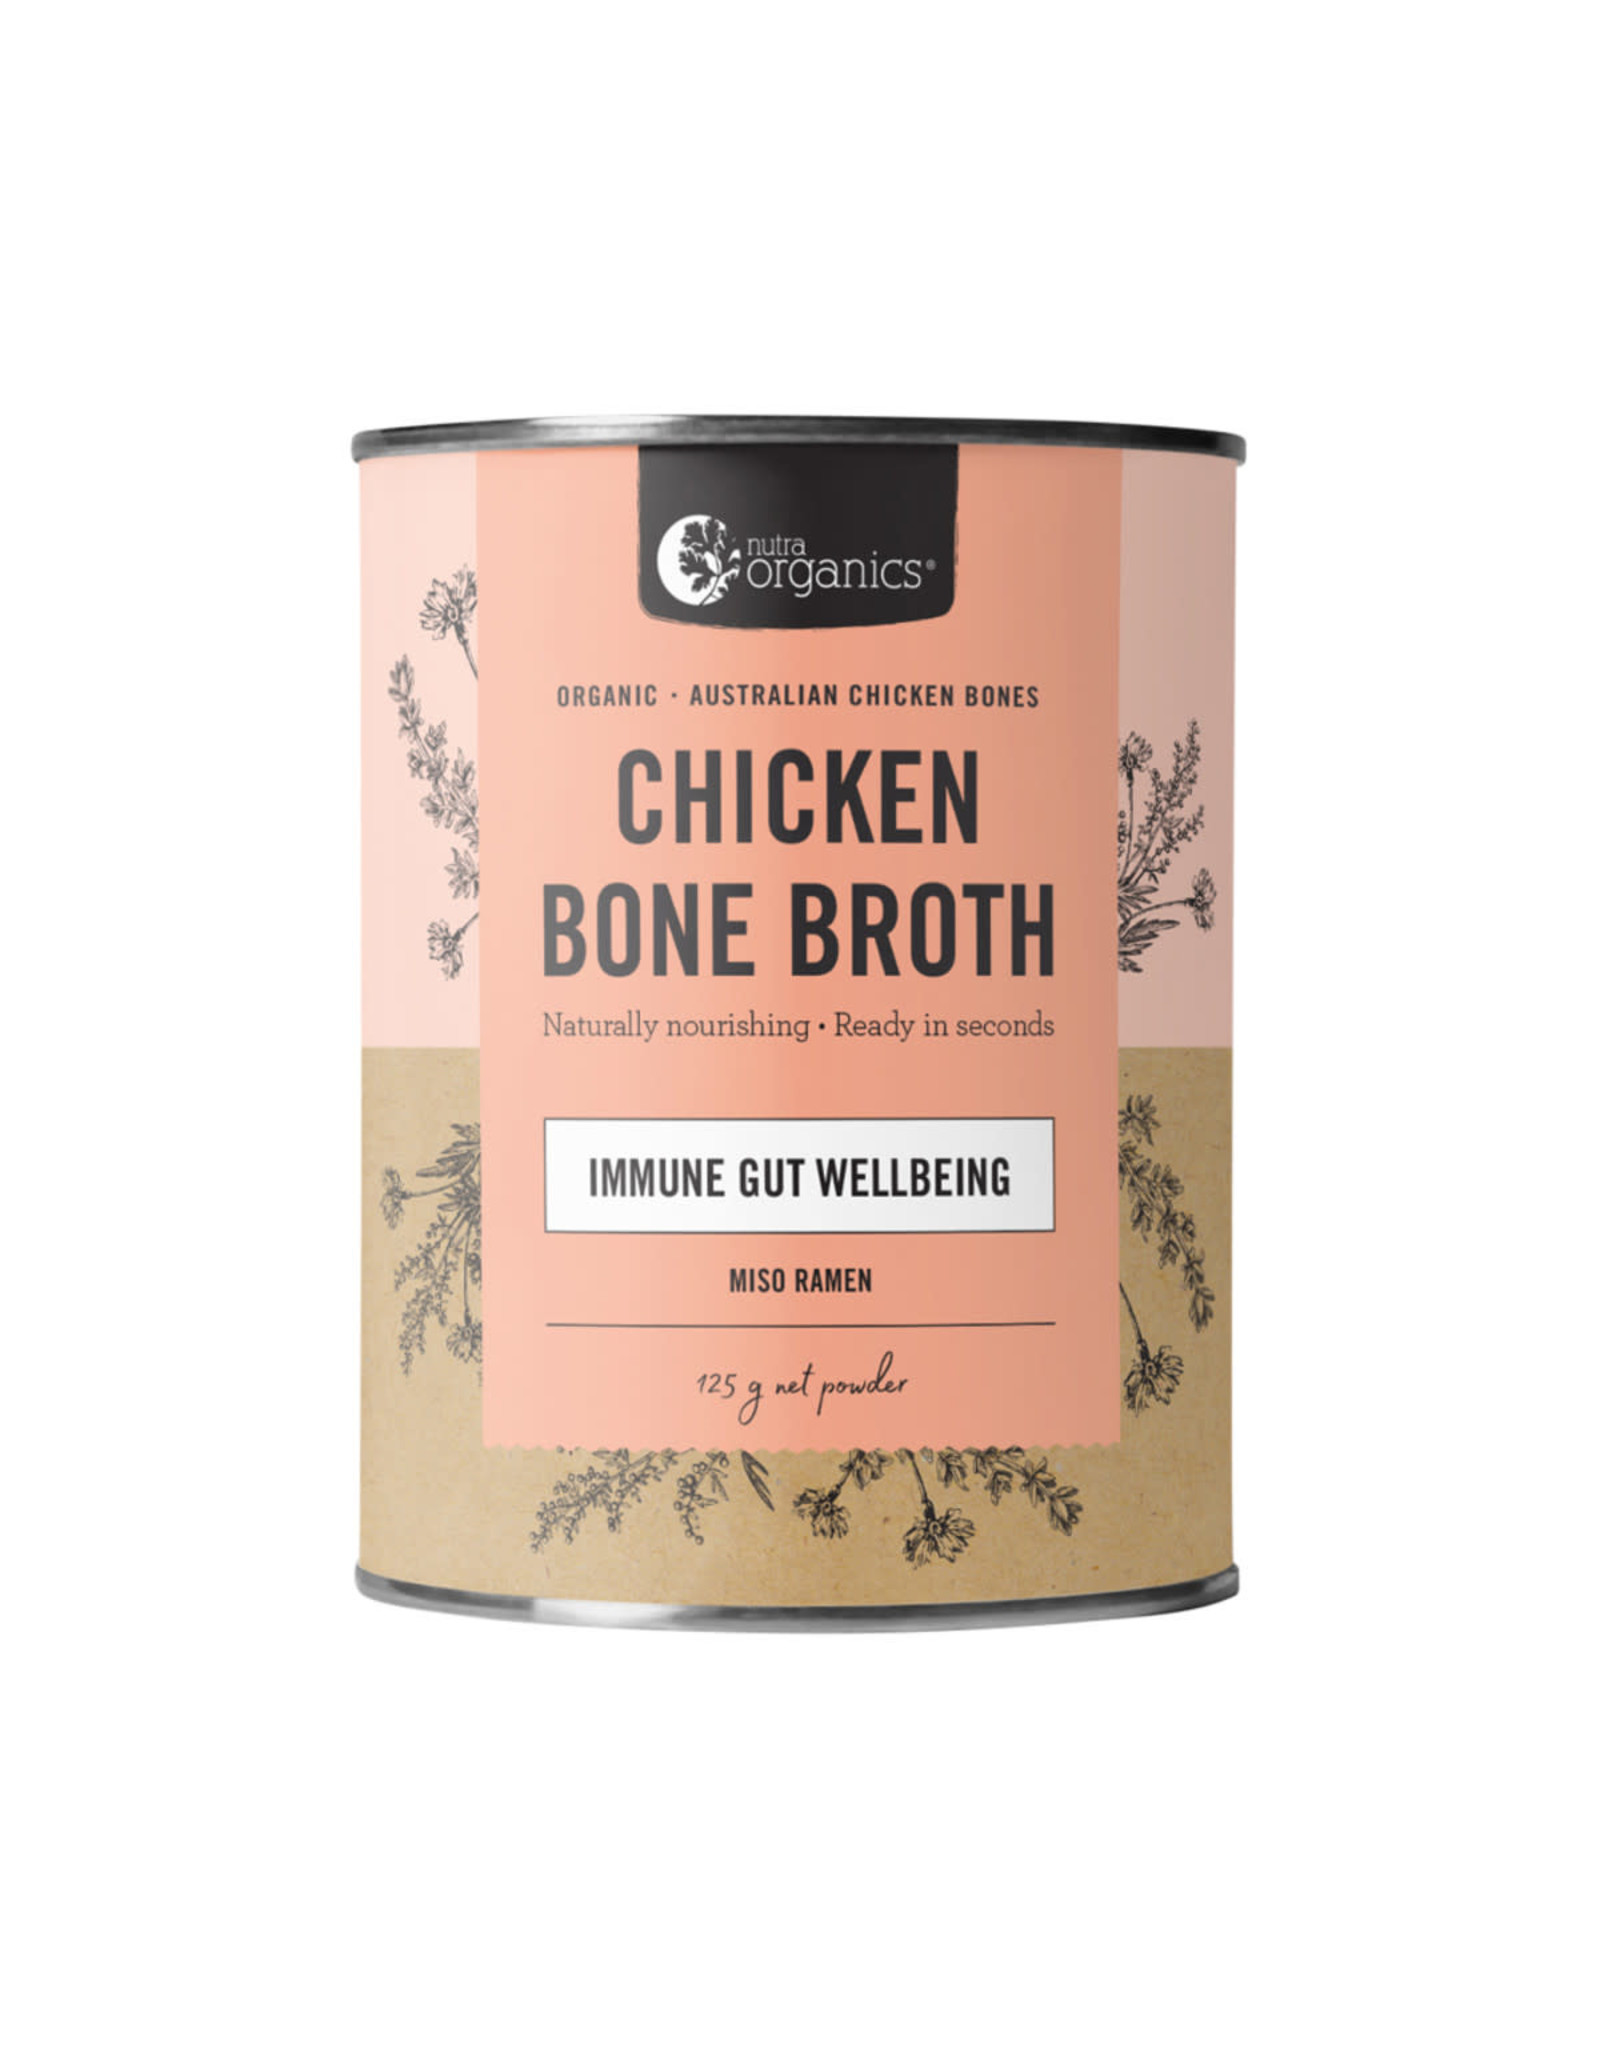 NutraOrganics Chicken Bone Broth Miso Ramen 125g